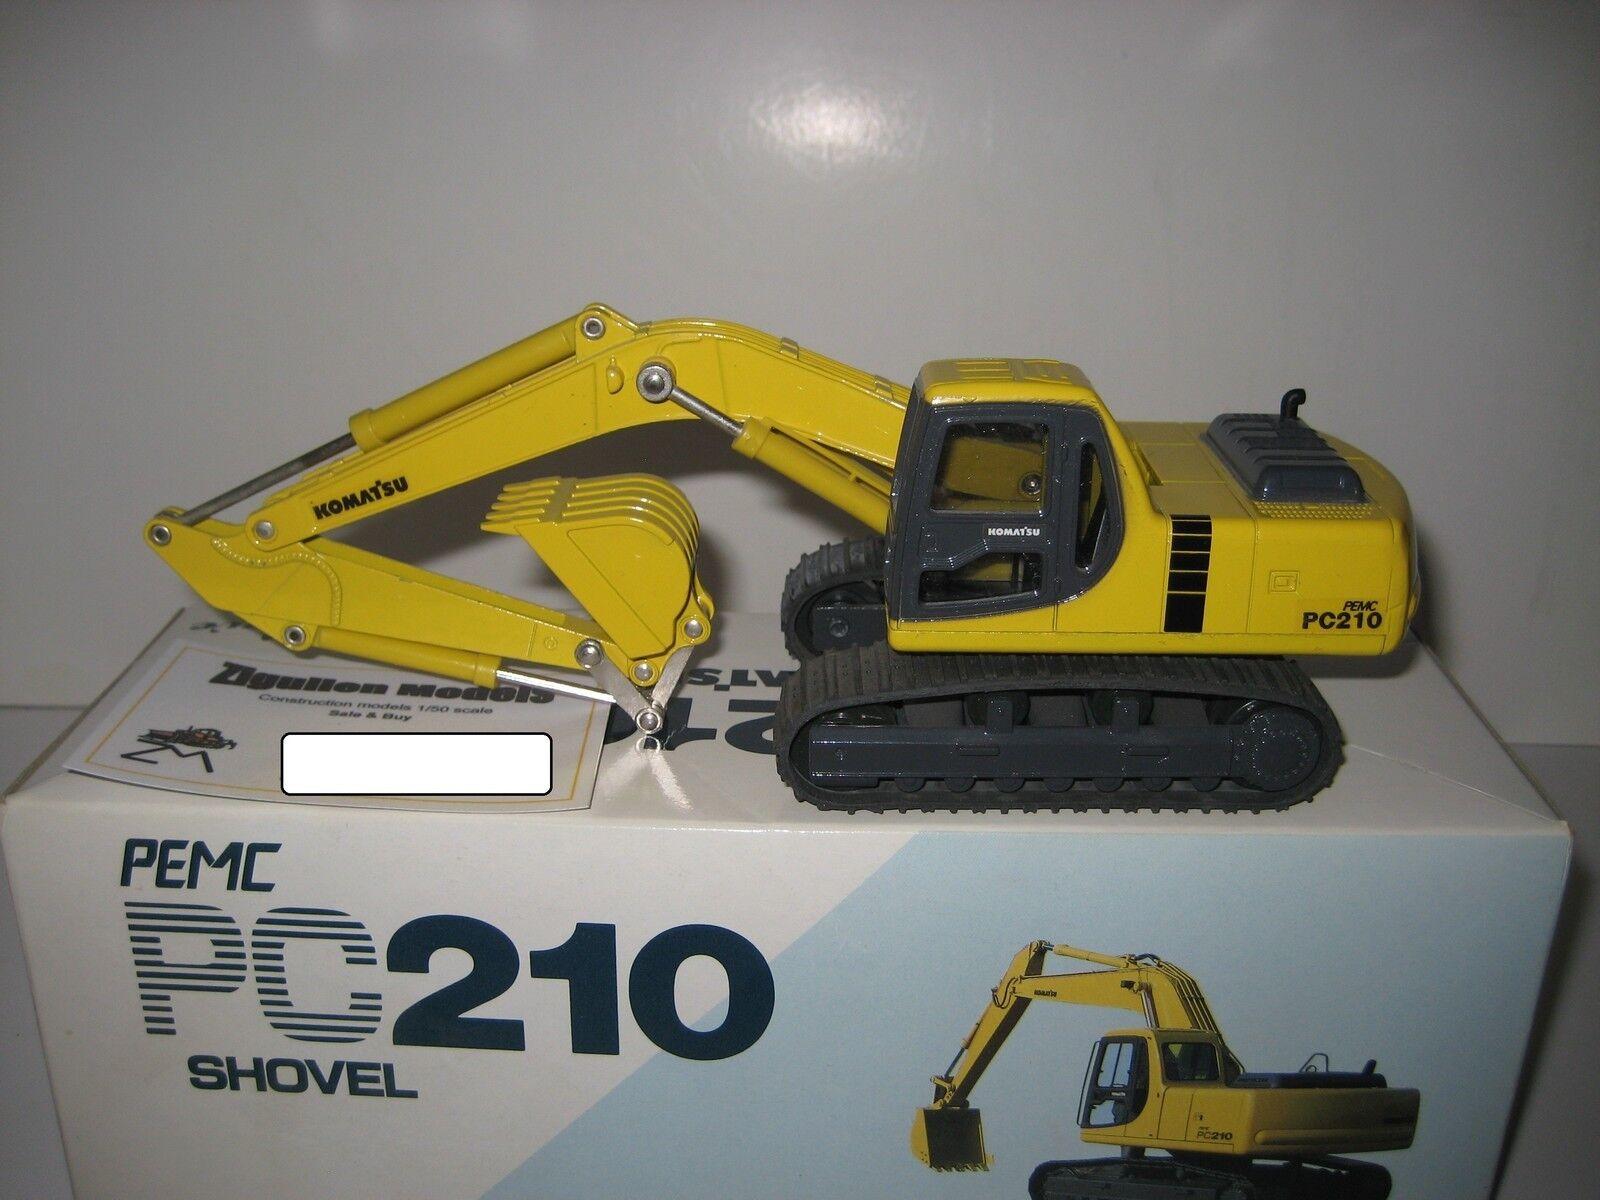 KOMATSU PC 210 Excavateurs tieflöffel à chenilles SHINSEI 1:43 neuf dans sa boîte | Prix D'aubaine